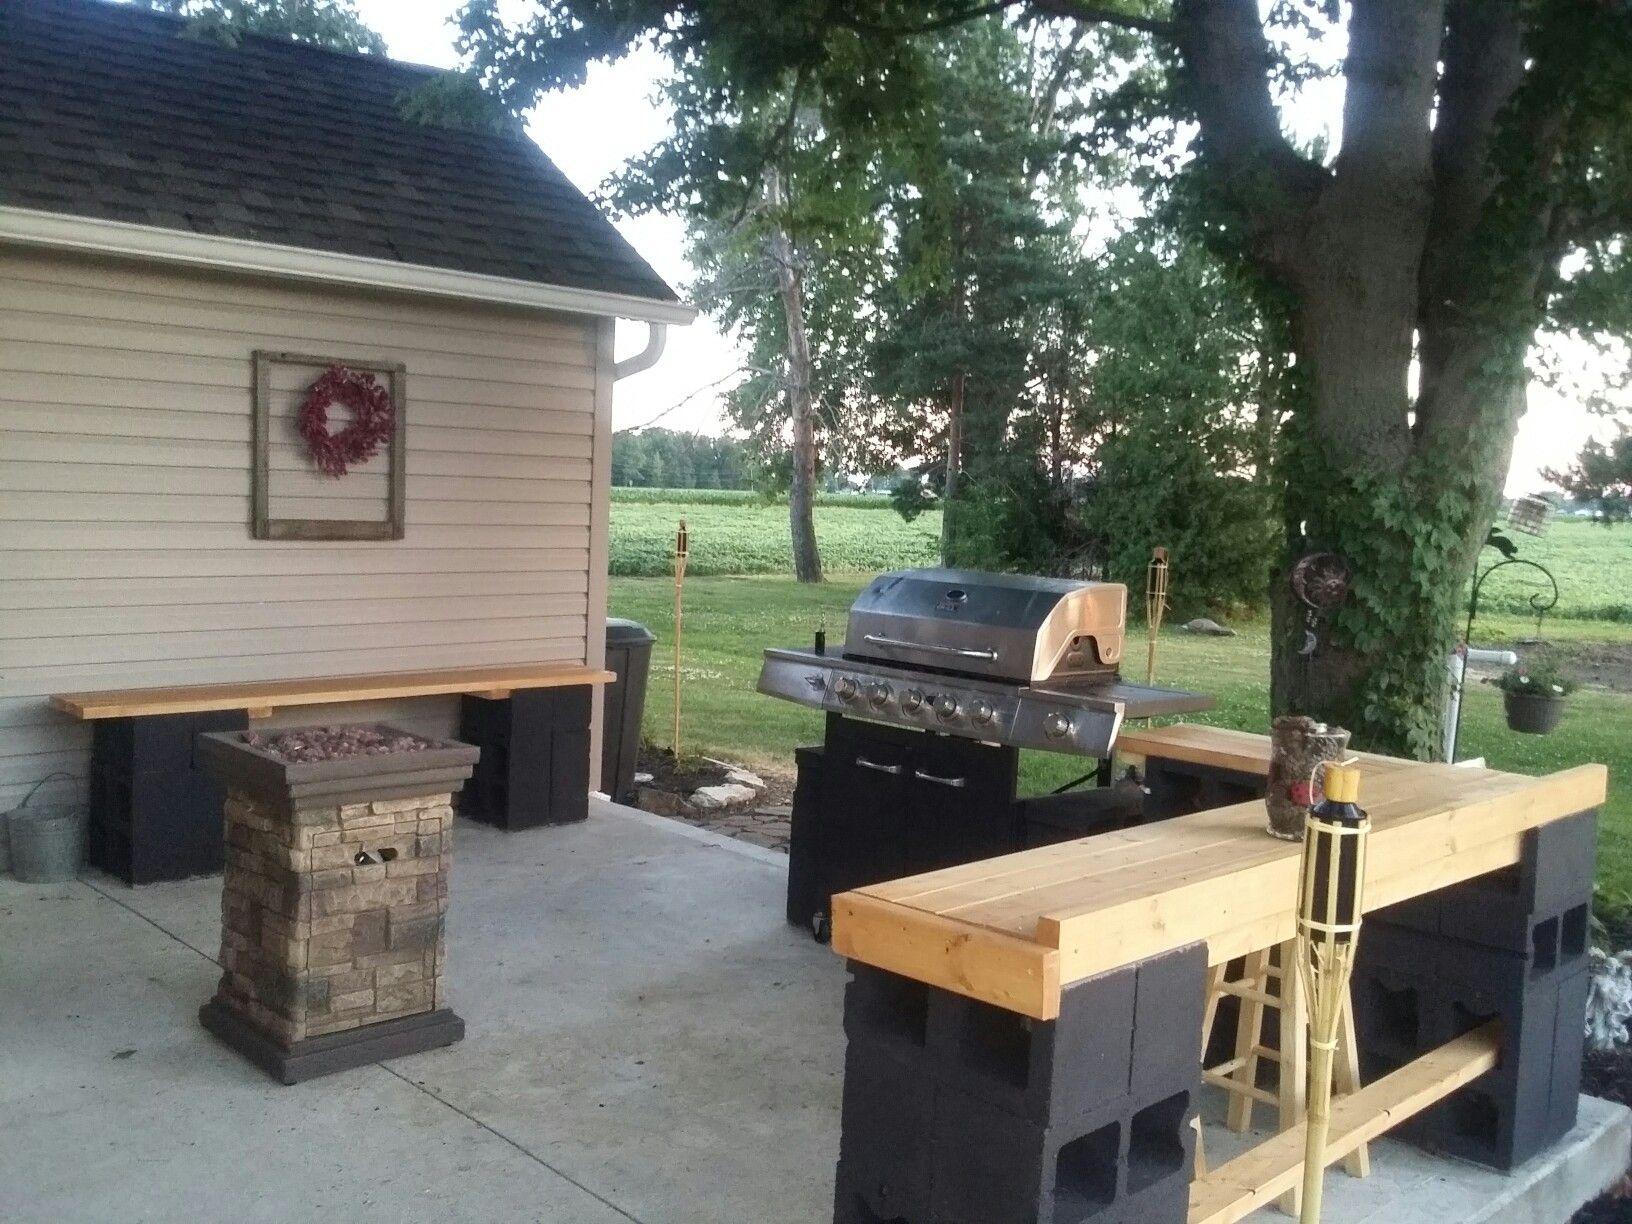 Cinder block patio furniture -Janice Lininger